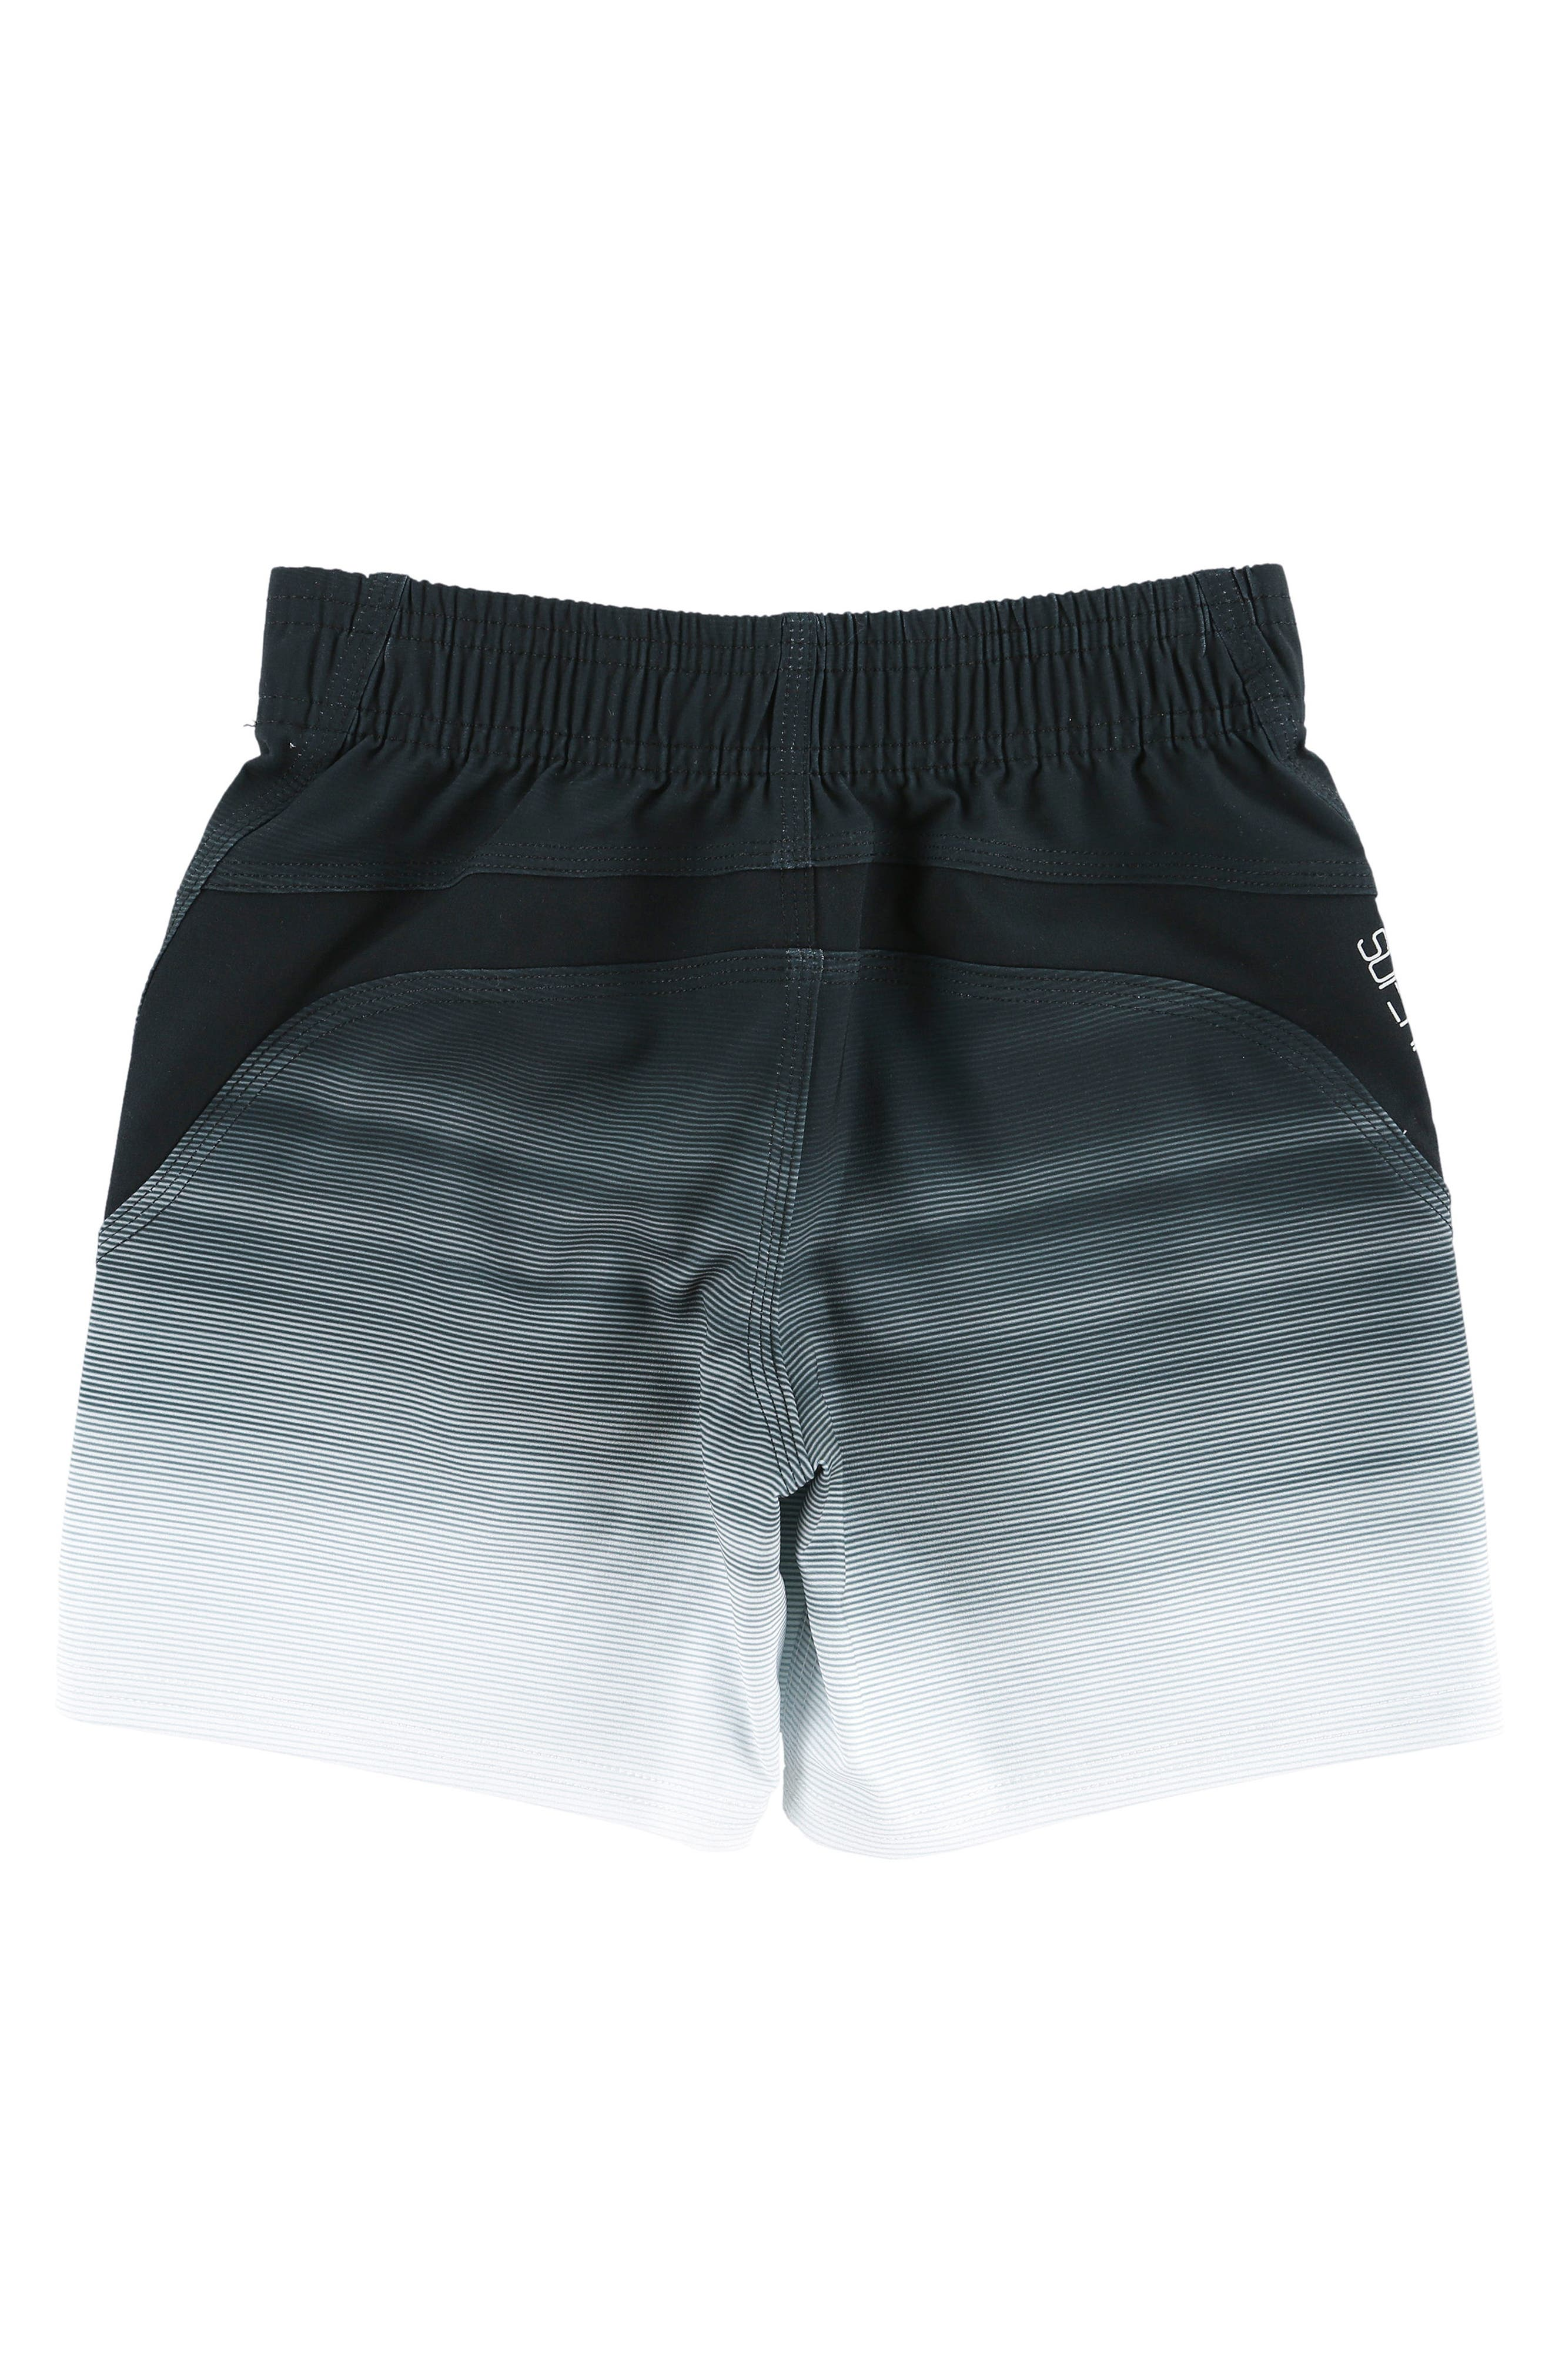 Sneakyfreak Mysto Board Shorts,                             Alternate thumbnail 2, color,                             Black